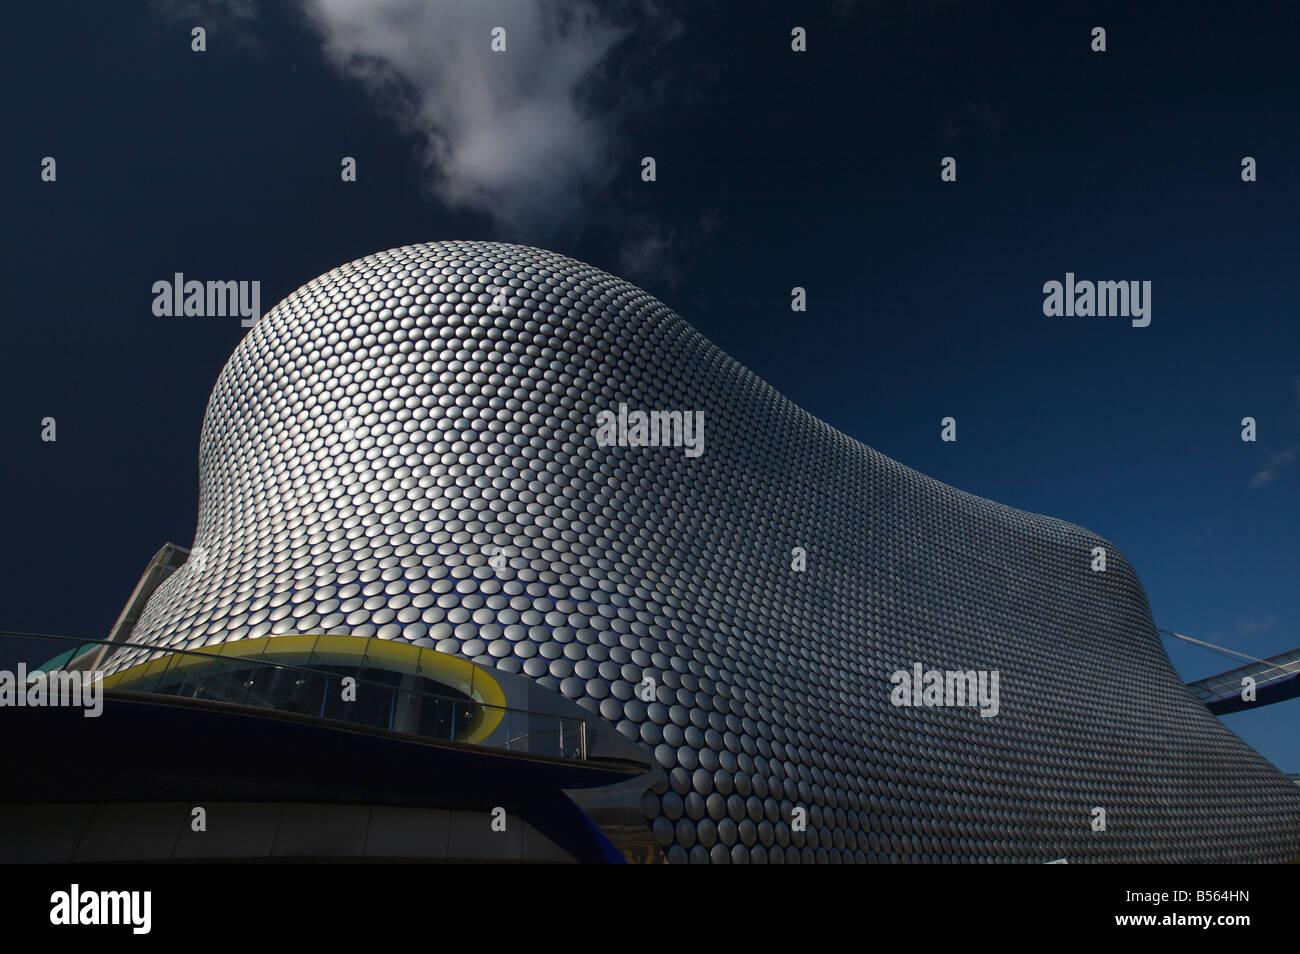 Selfridges Department Store Bullring Shopping Centre Birmingham West Midlands England UK - Stock Image